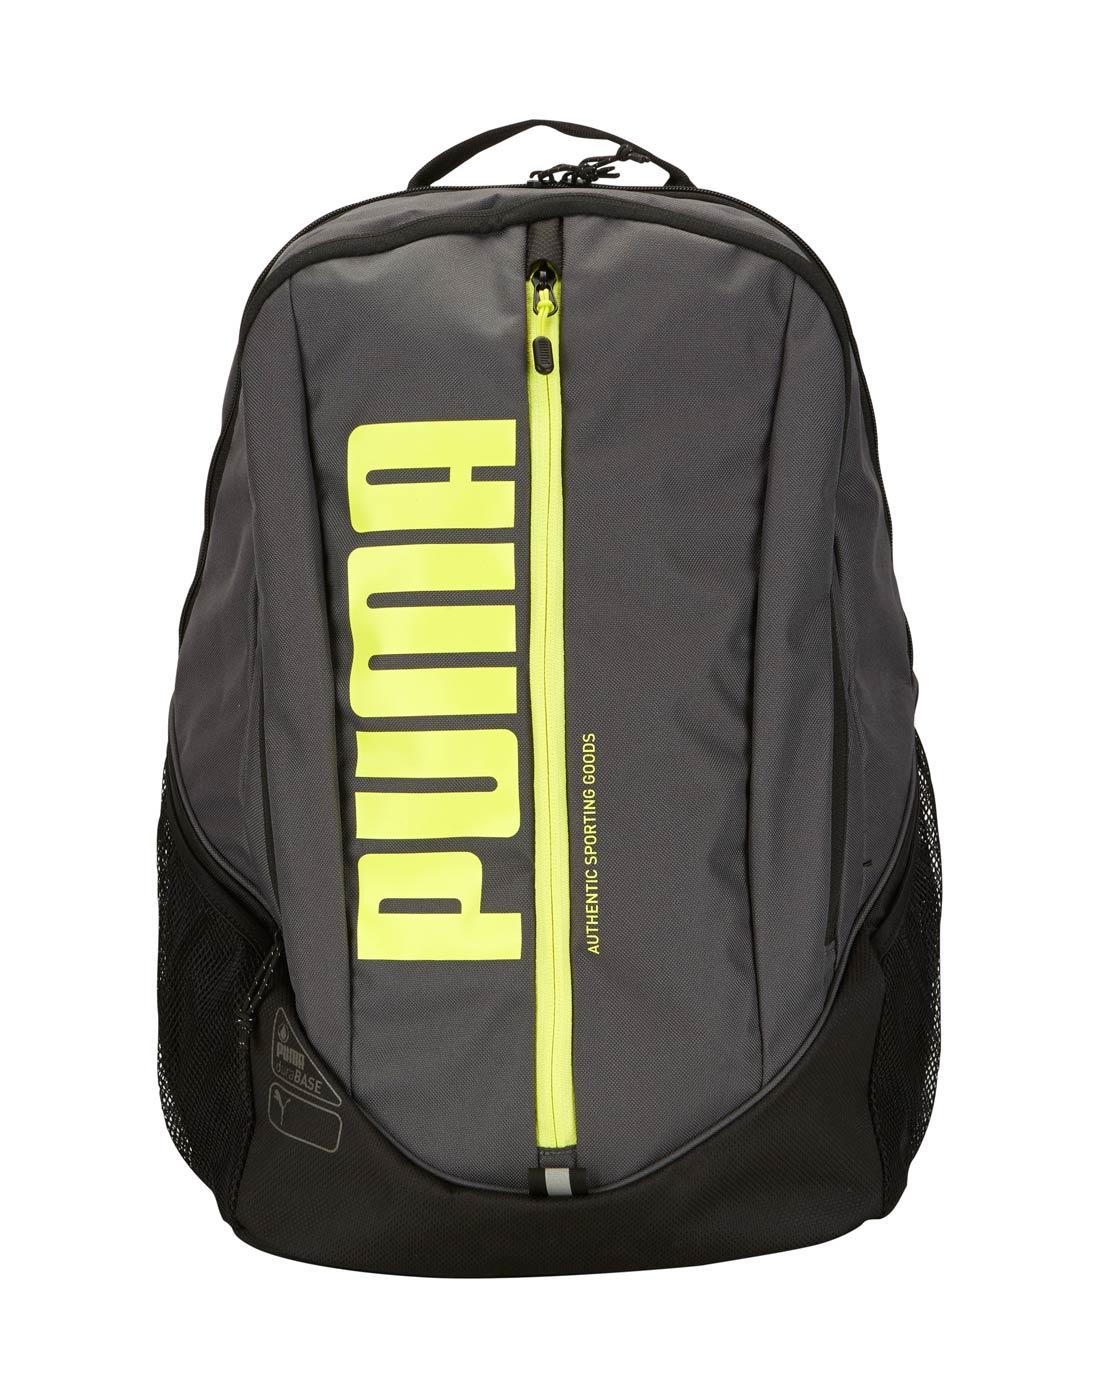 40eba2b8d8 Puma Deck Backpack